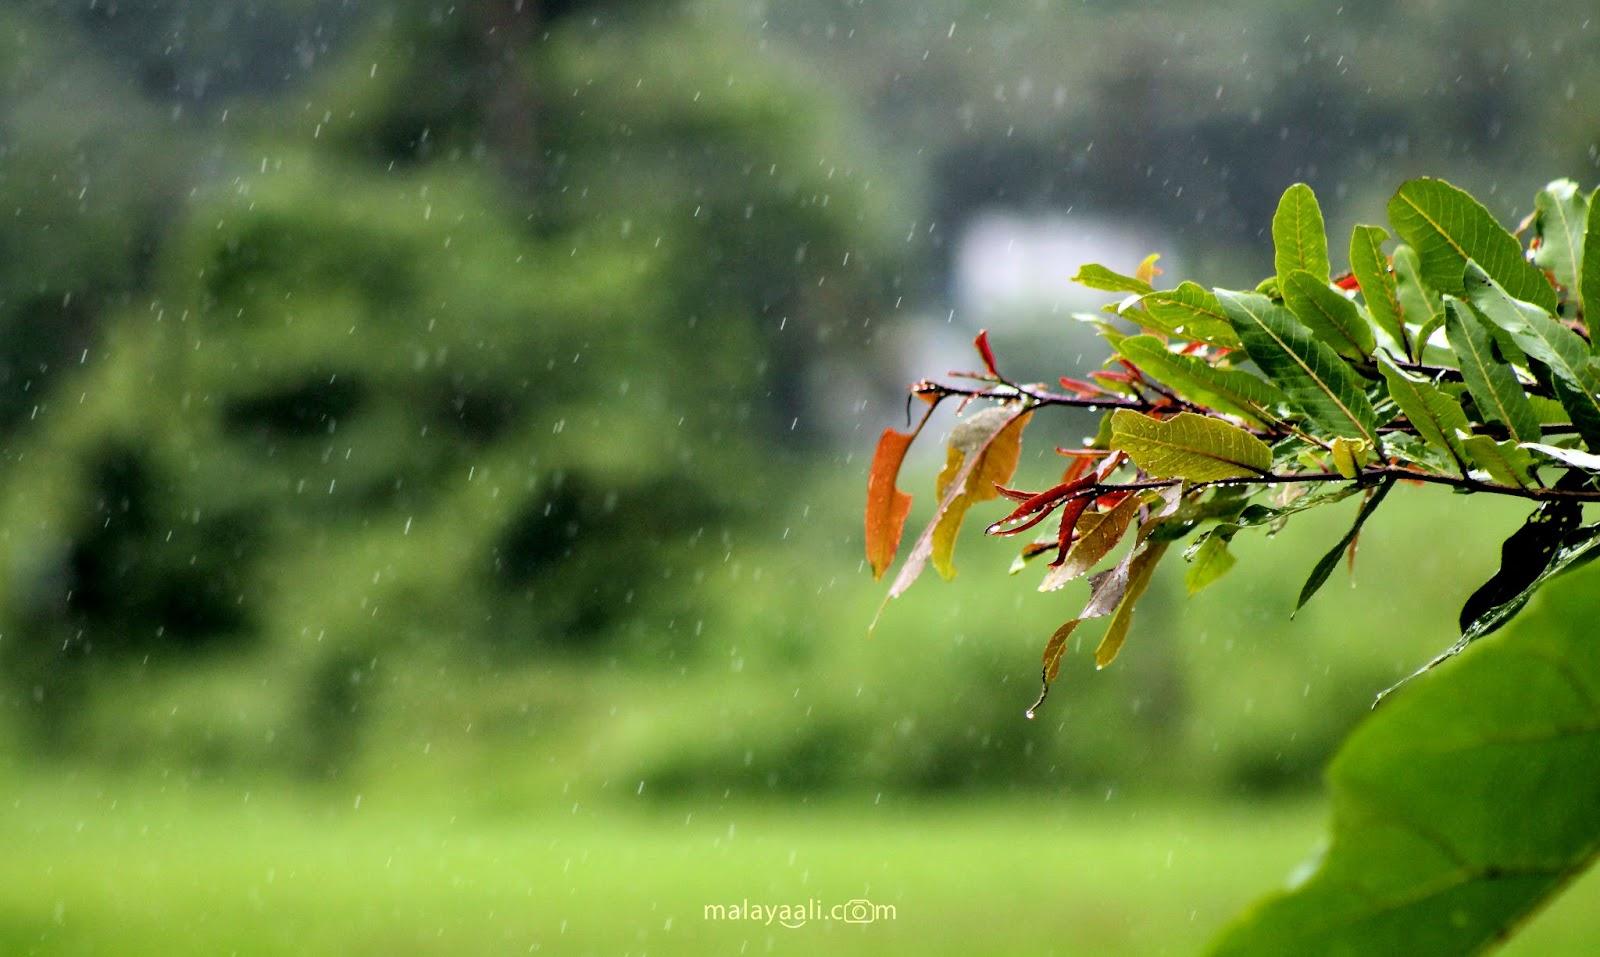 Rain, Mazha, Kerala, Sukrutham, Malayali, Peringode, Malayali Peringode, മലയാളി, പെരിങ്ങോട്, മഴ, മൺസൂൺ, കേരളം, പച്ച, Green